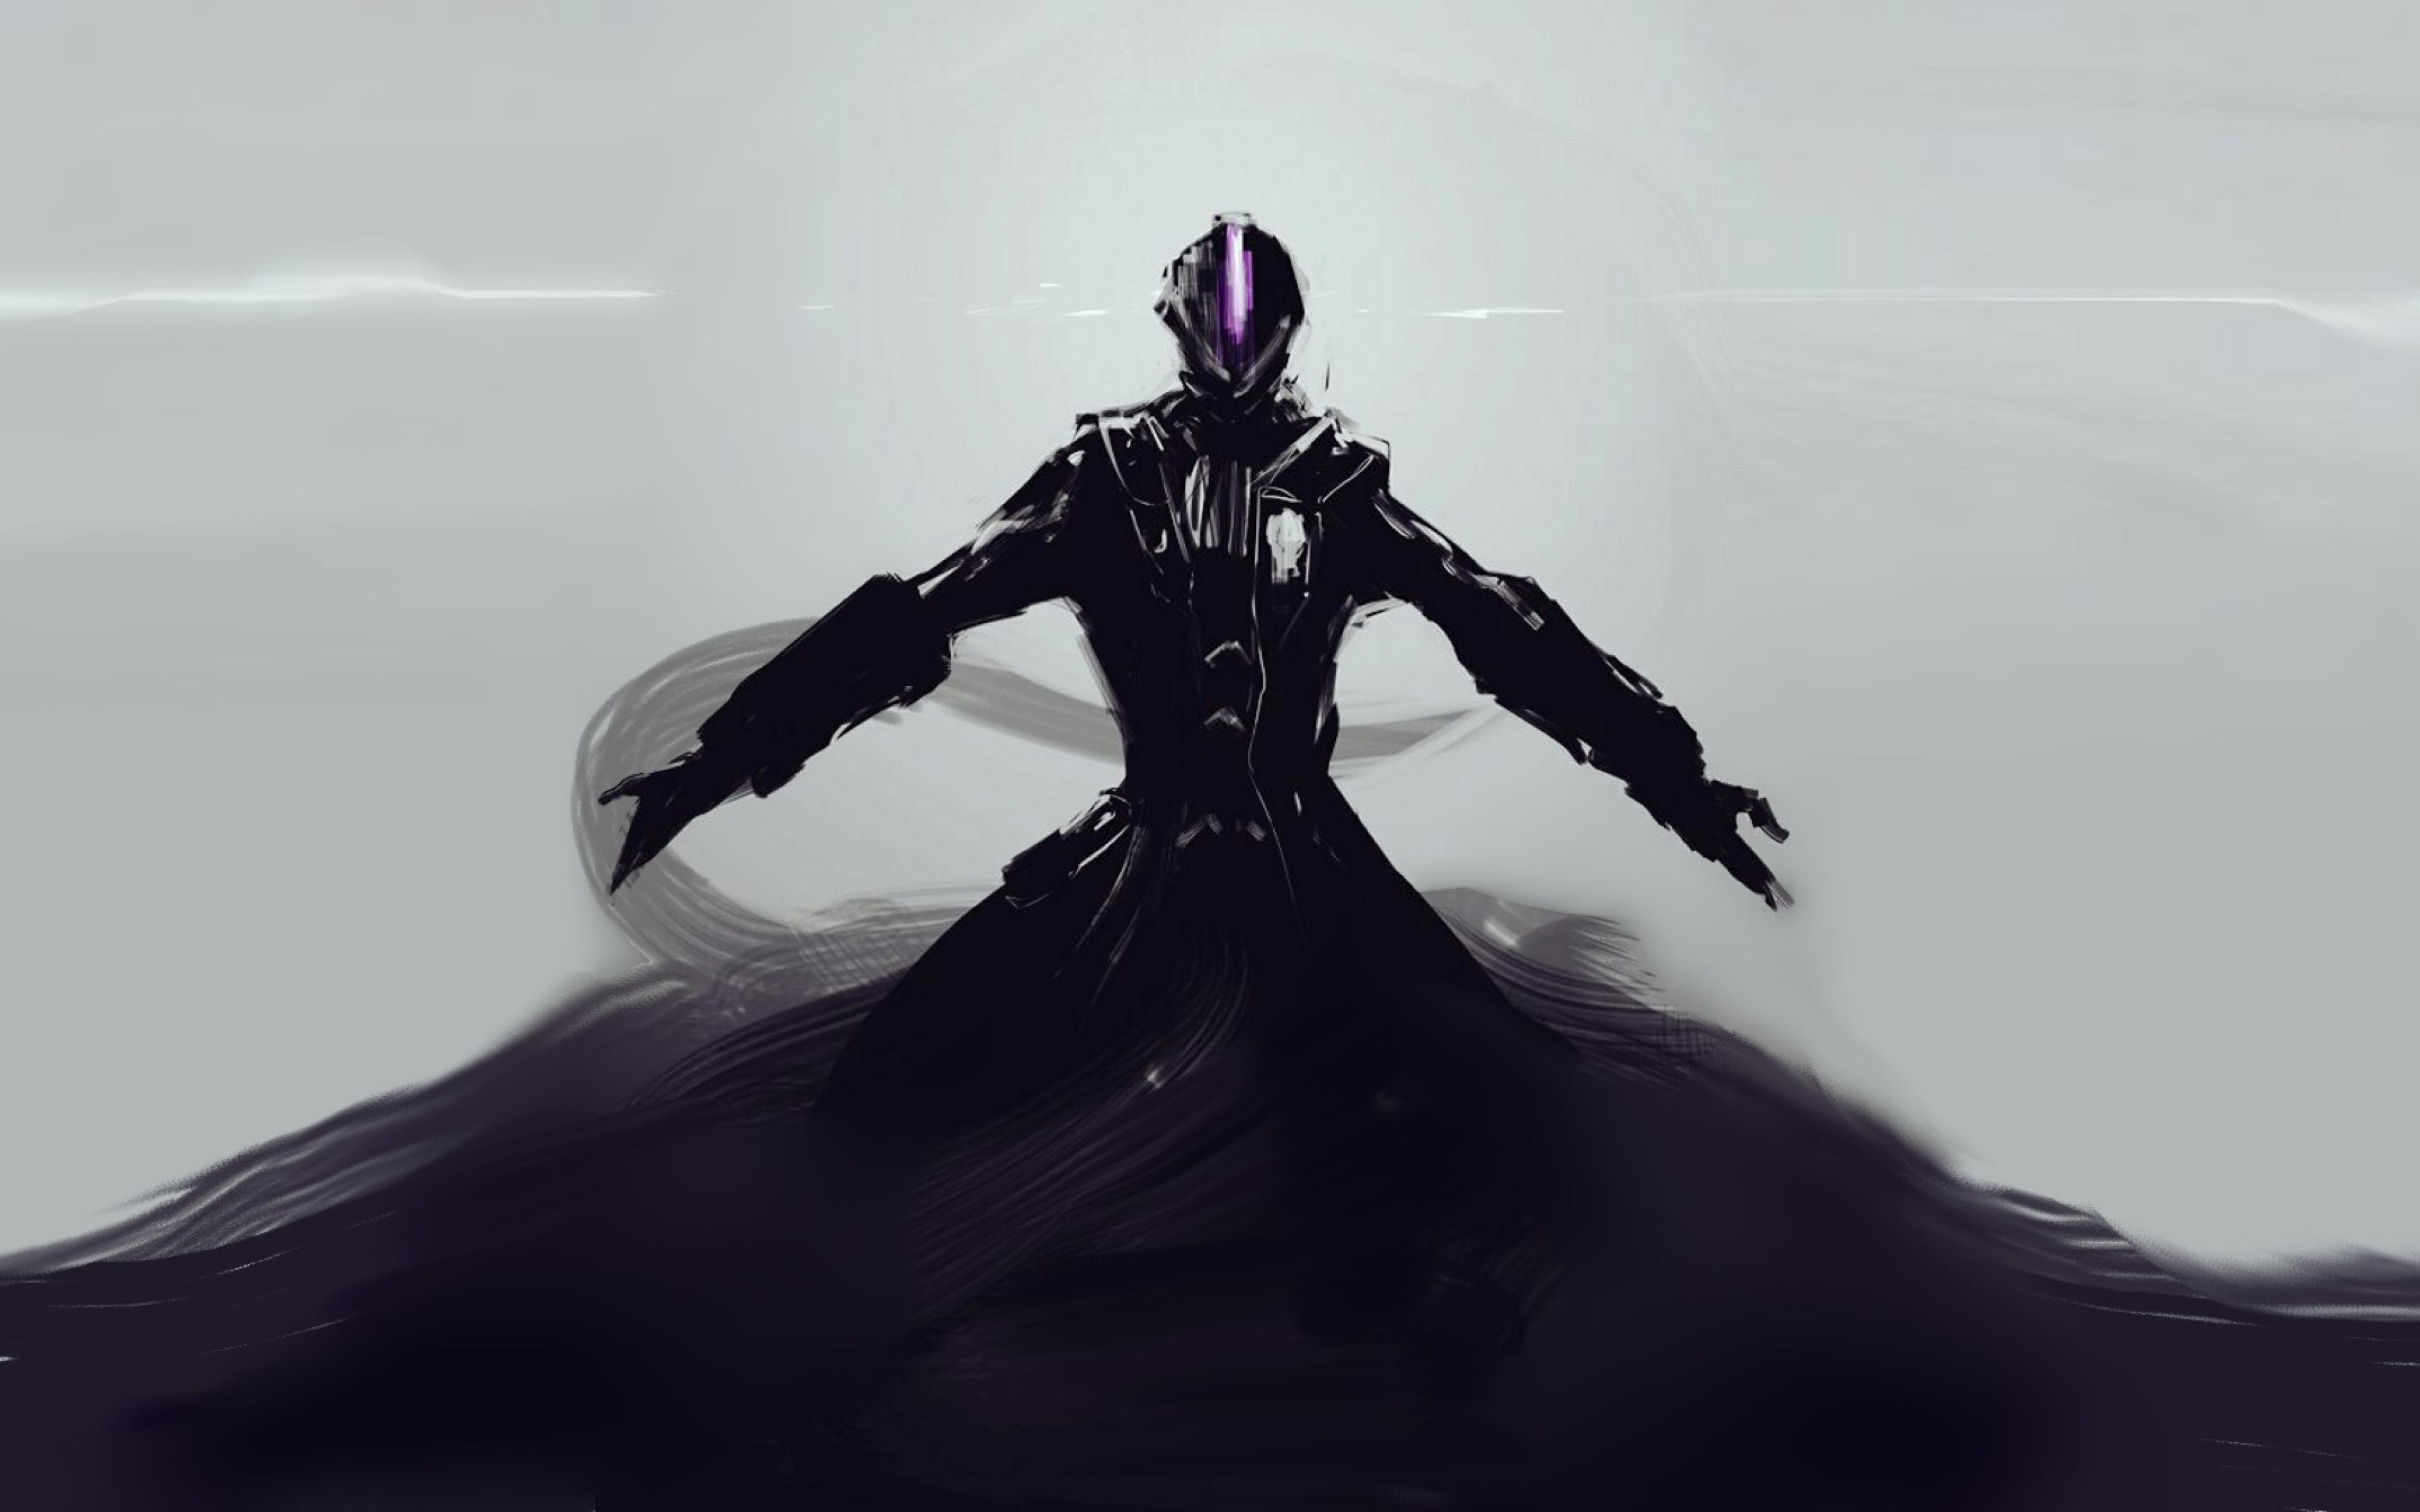 anime dark wallpapers 4k: Dark Anime Creature Figure Art, Full HD Wallpaper